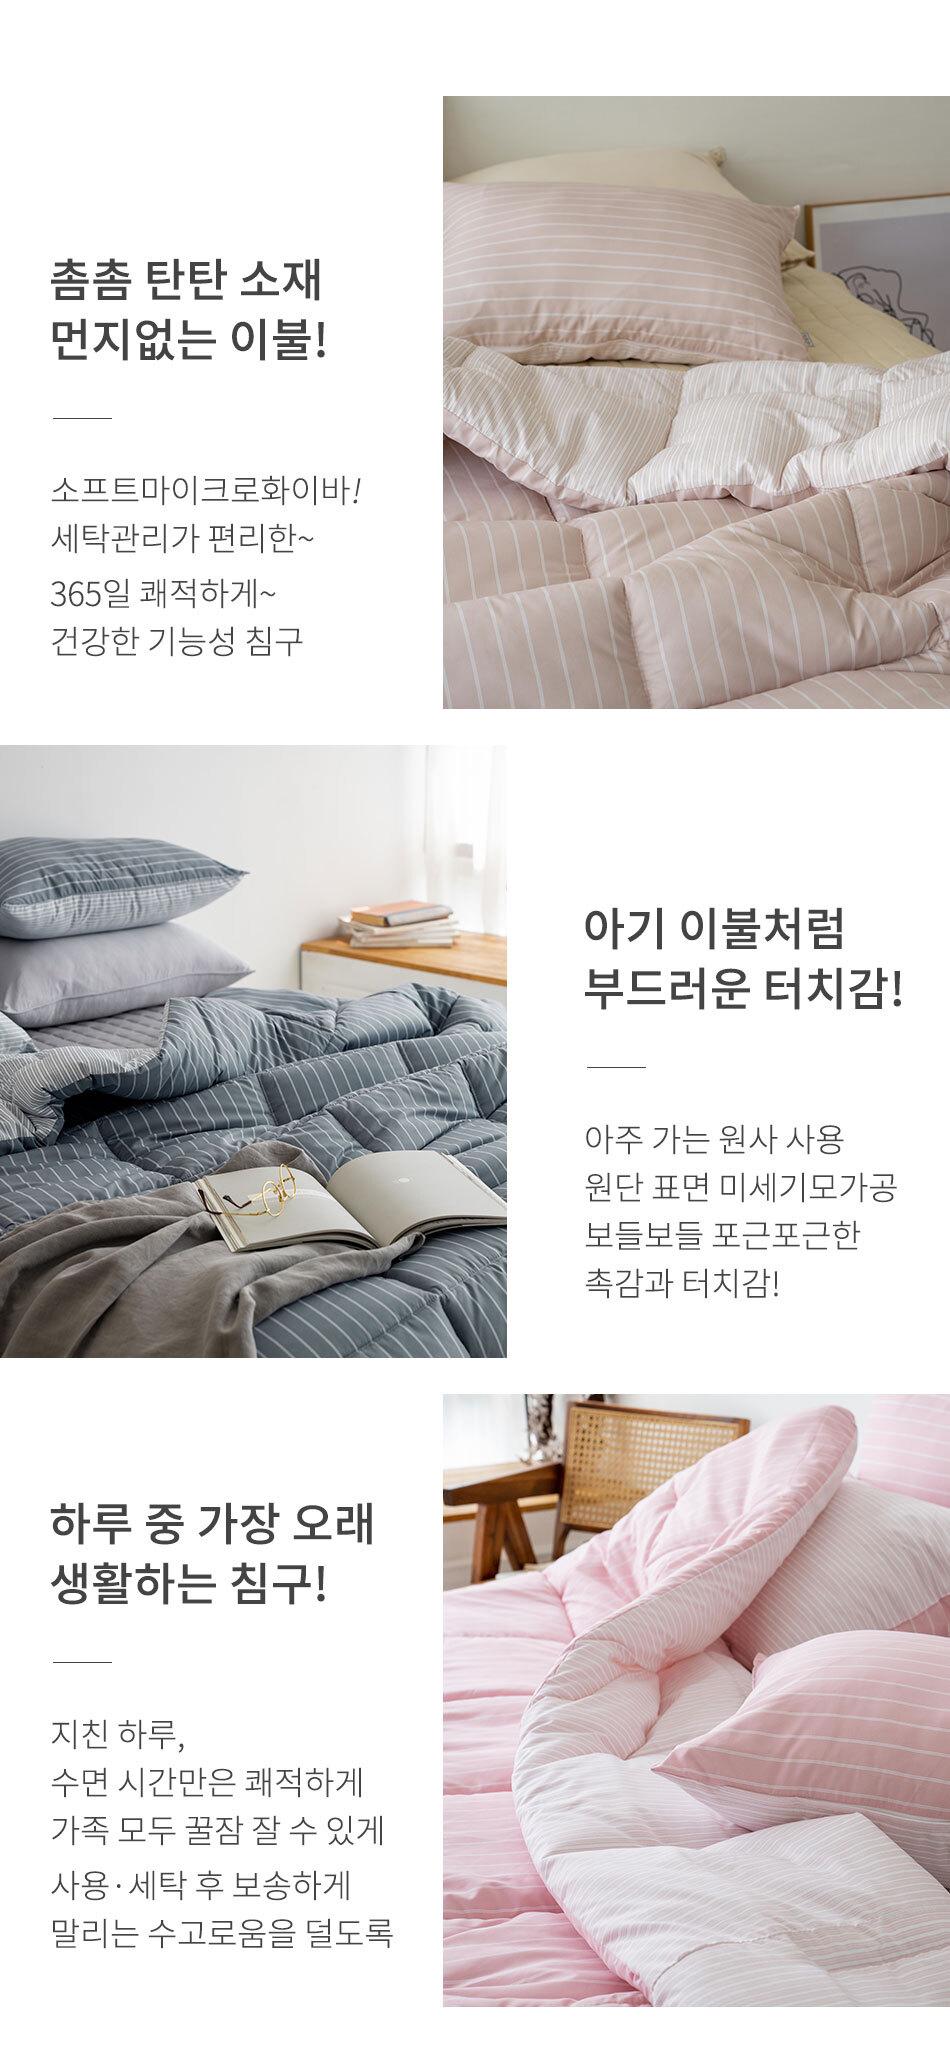 urban_bed_06.jpg